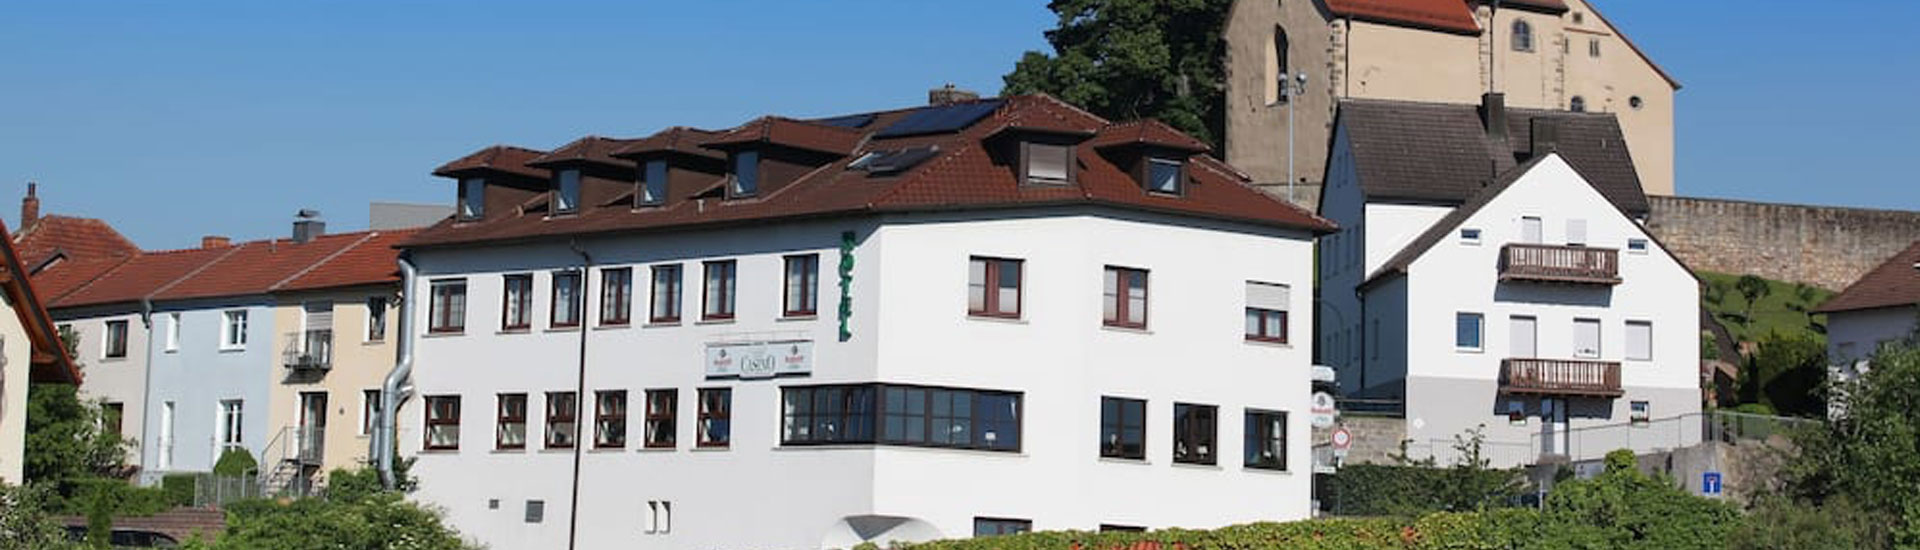 Camphausen Altes Casino